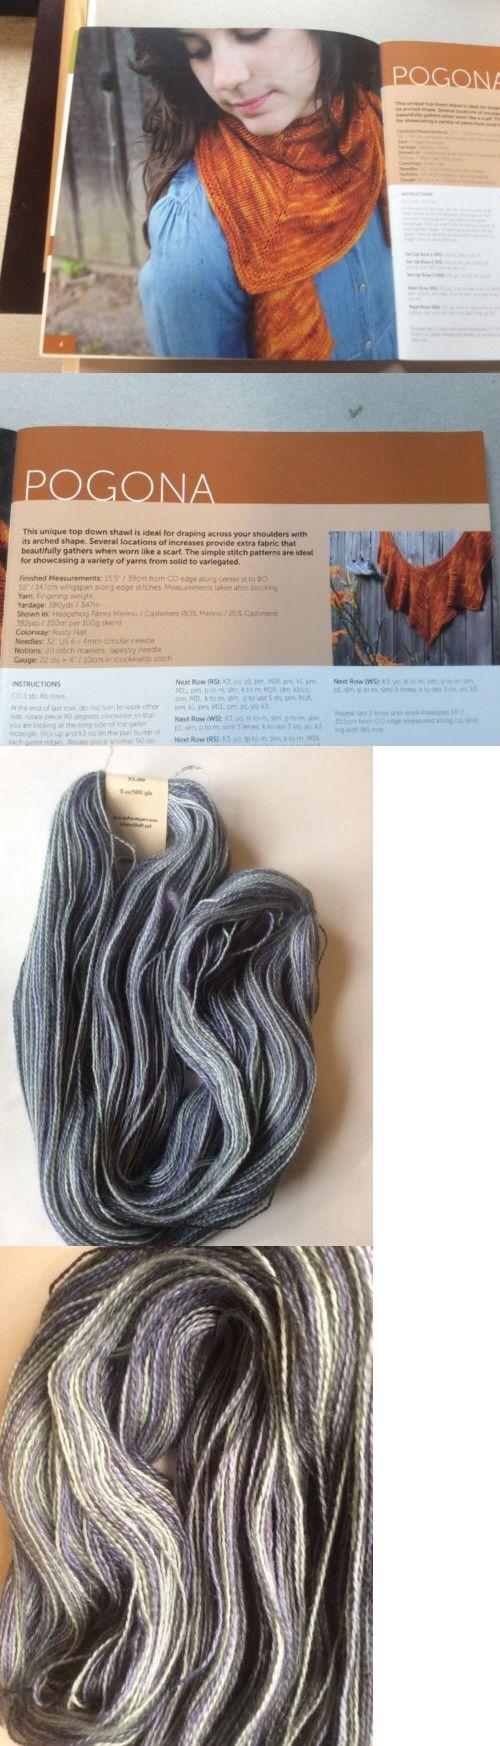 Knitting Kits 108868: Stephen West Pogona Shawl With Brooks Farm Primero 100% Kid Mohair -> BUY IT NOW ONLY: $30 on eBay!